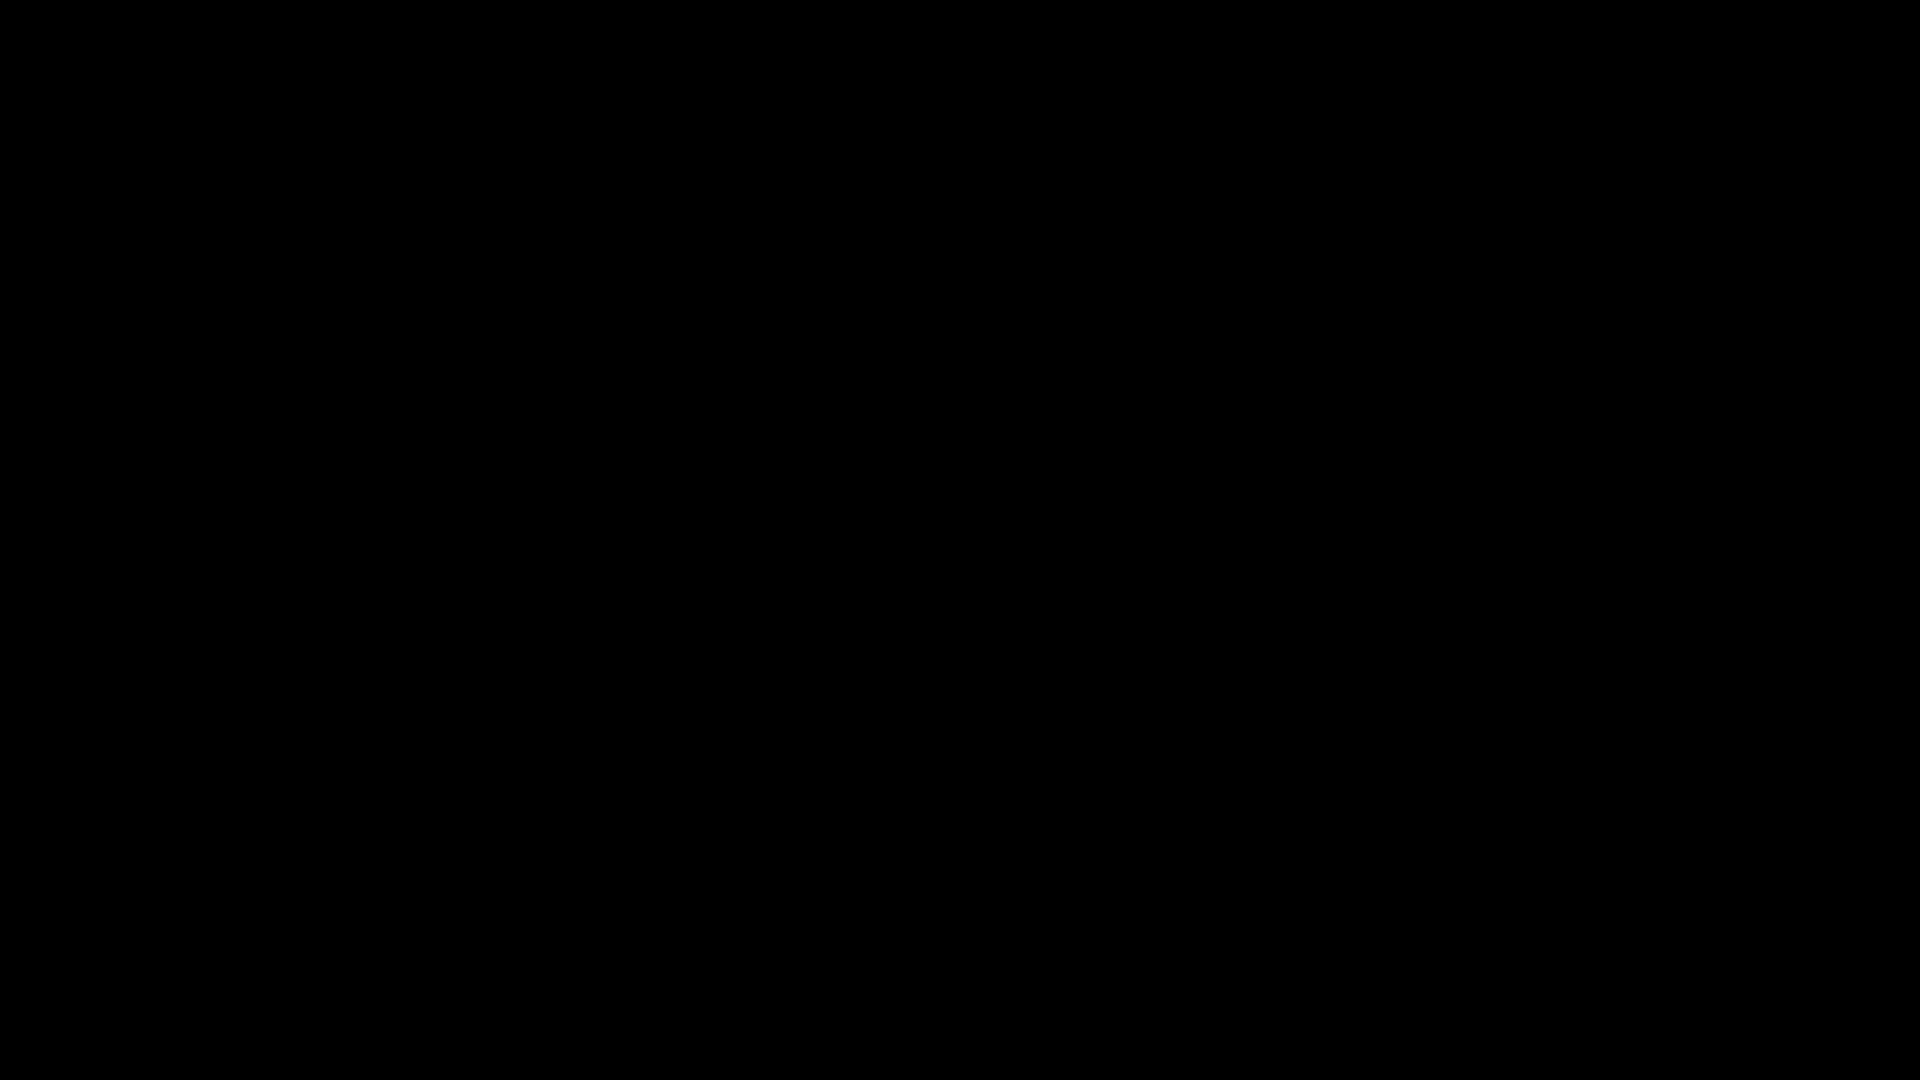 hitam polos